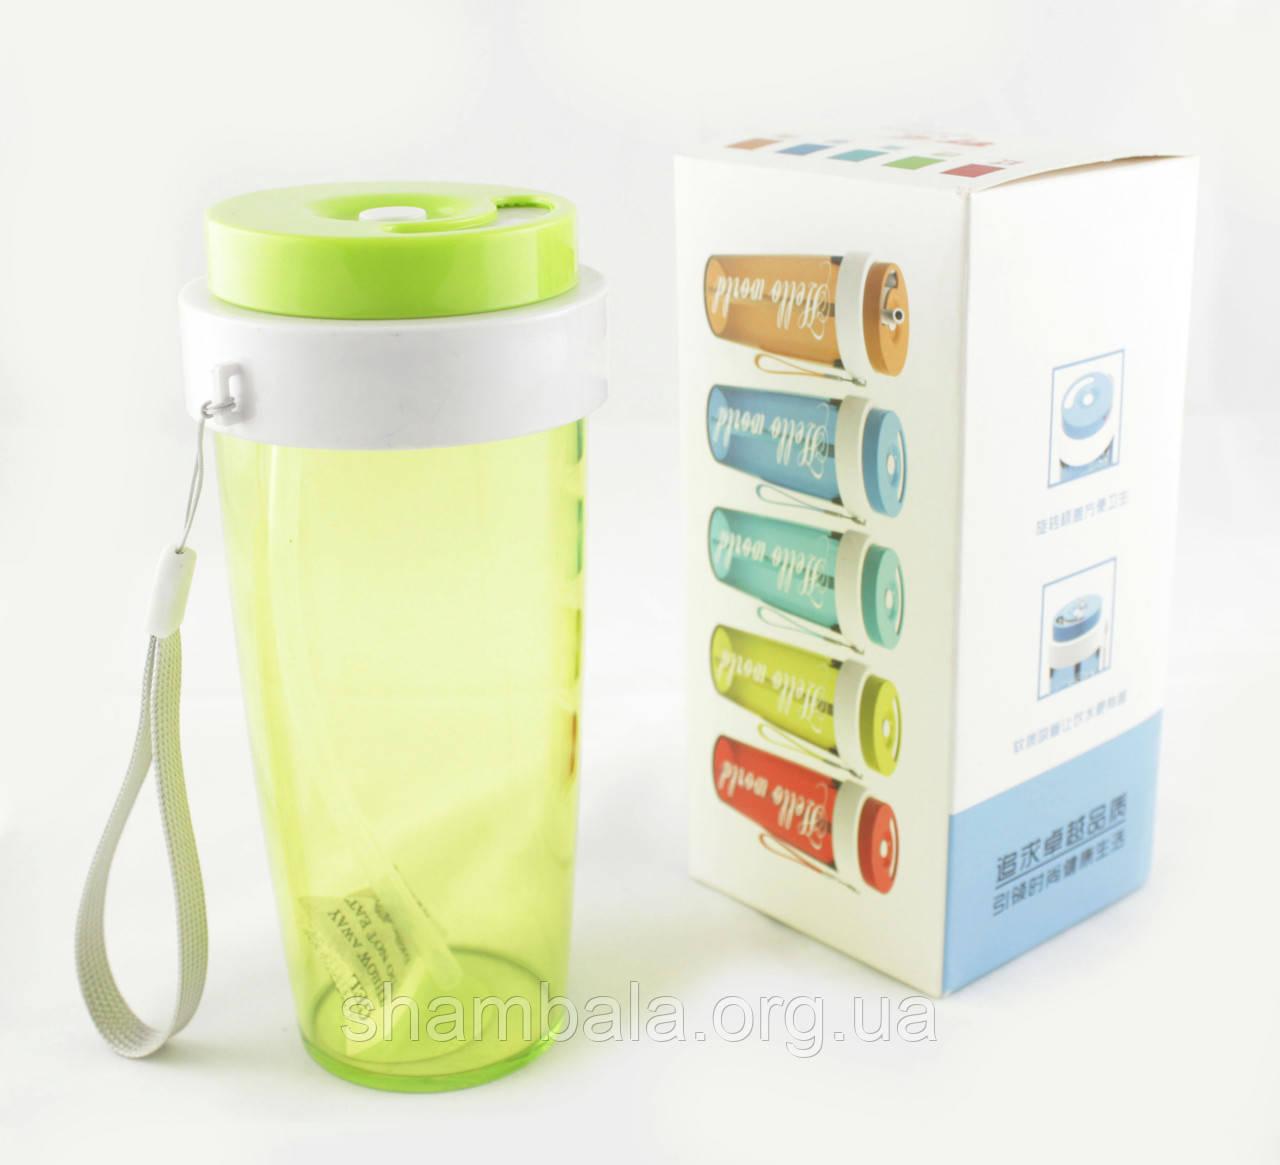 Стакан-бутылка для воды салатовый (034584)